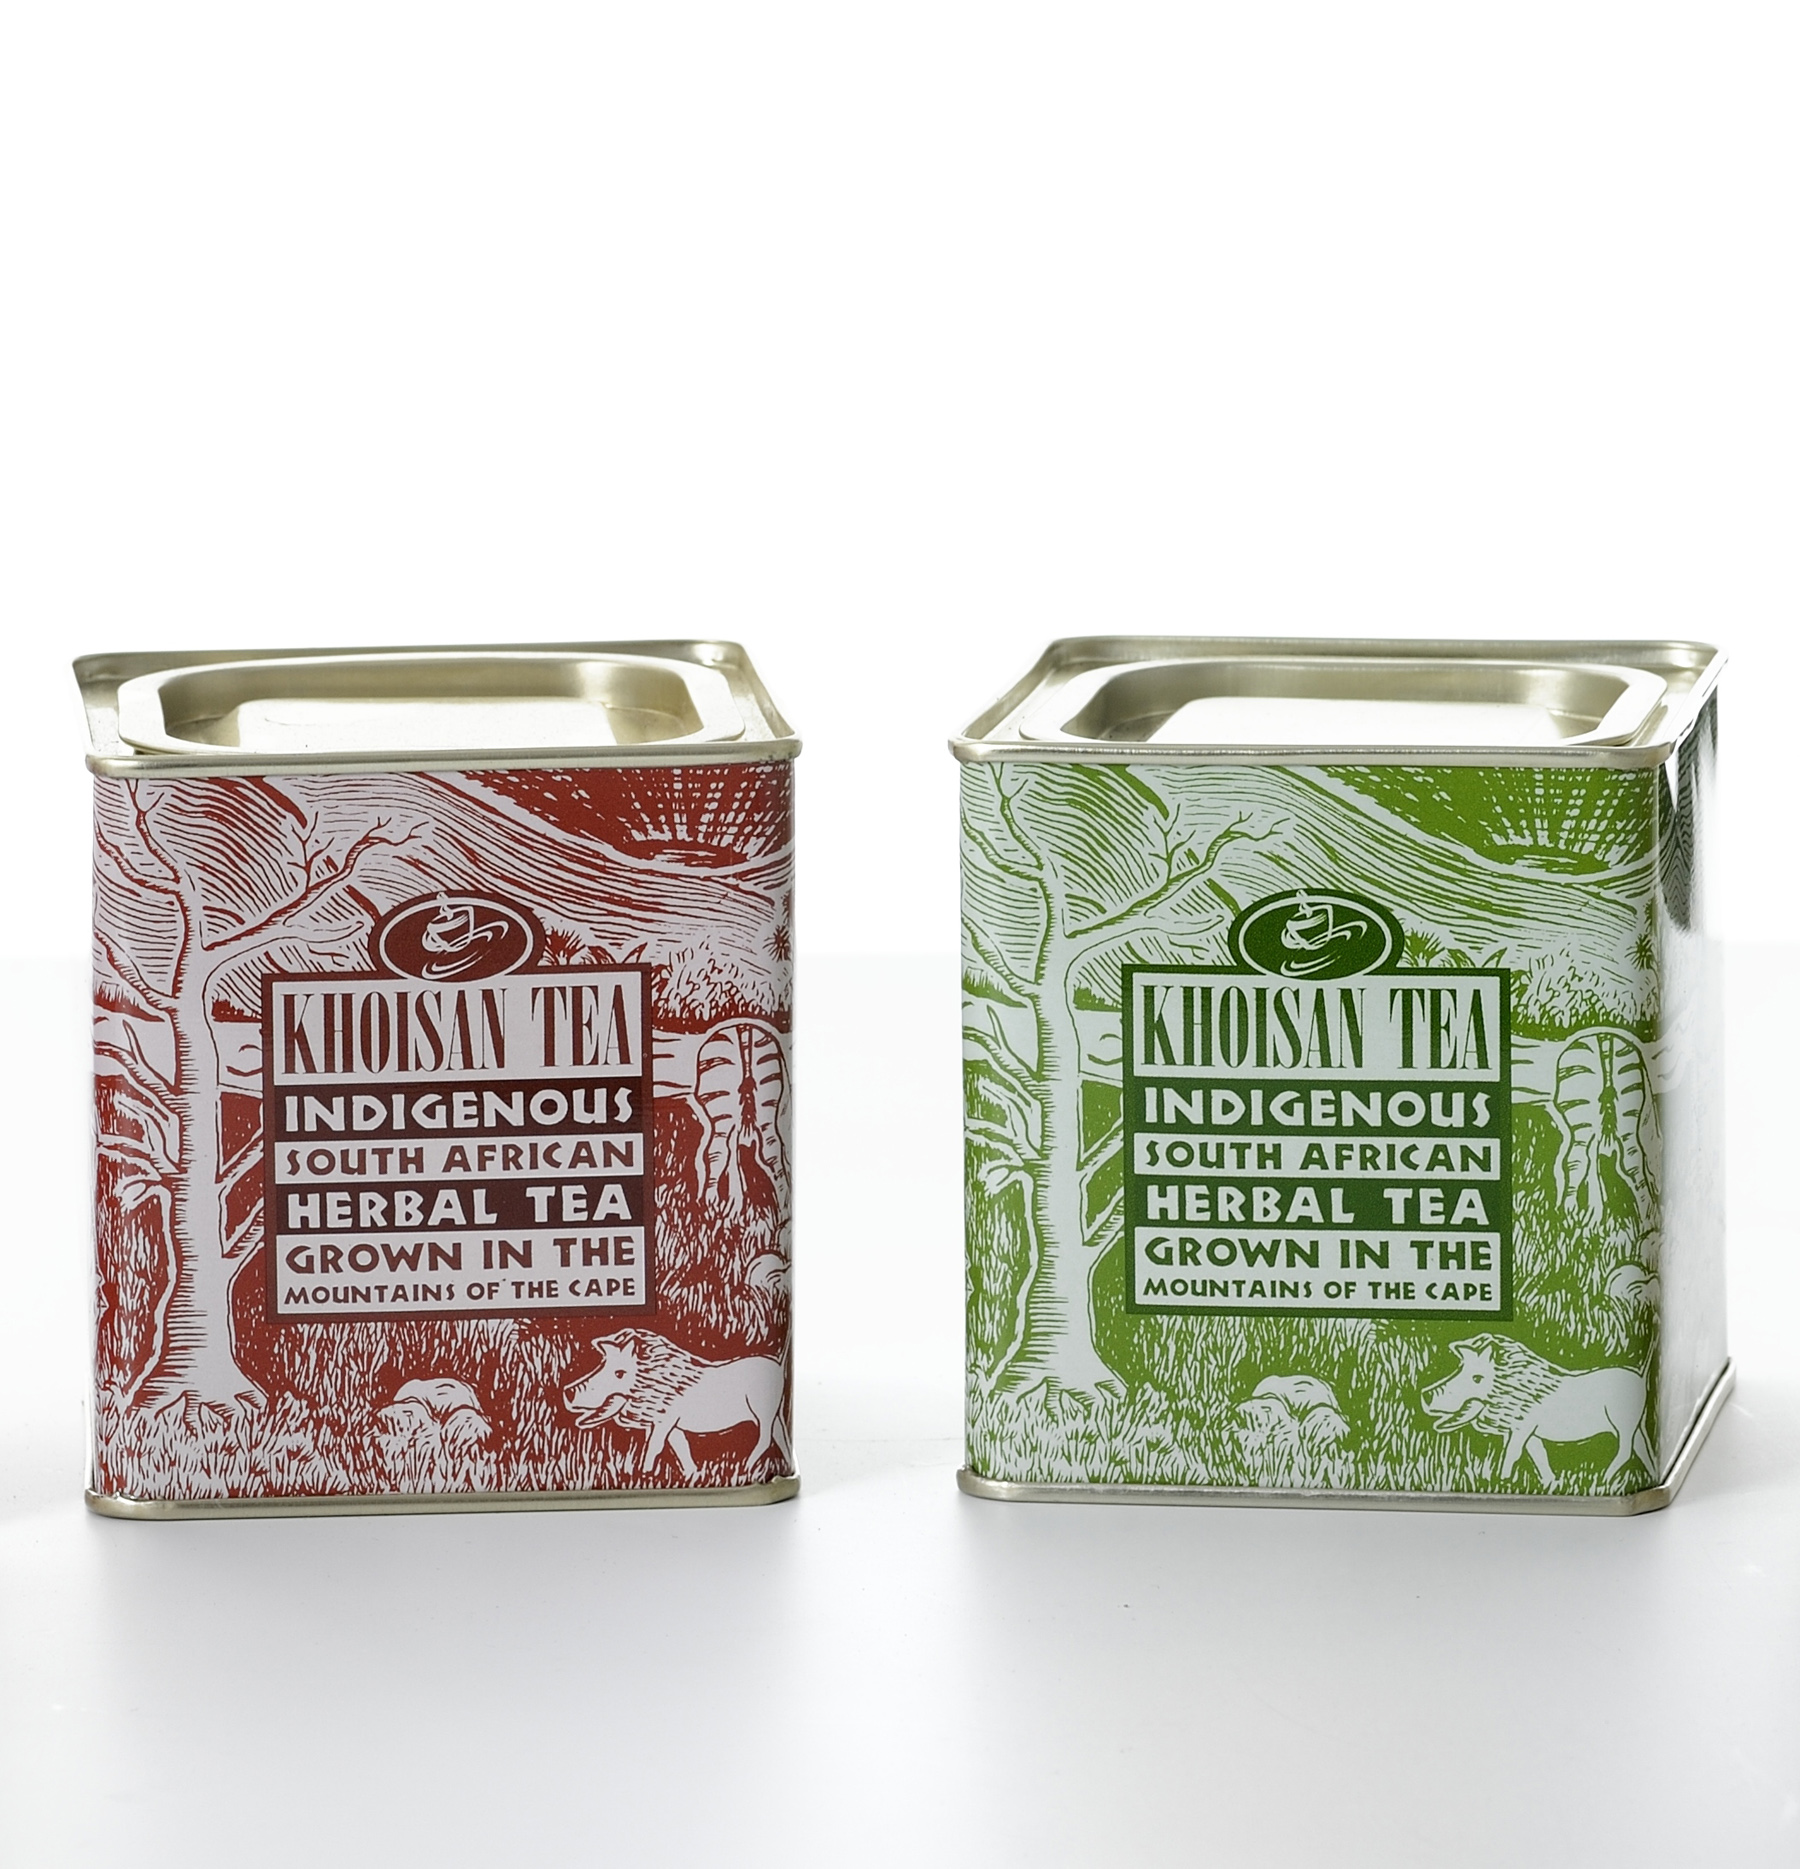 Photo 2_Khoisan Red and Green Rooibos Tea_Tin Set_resized